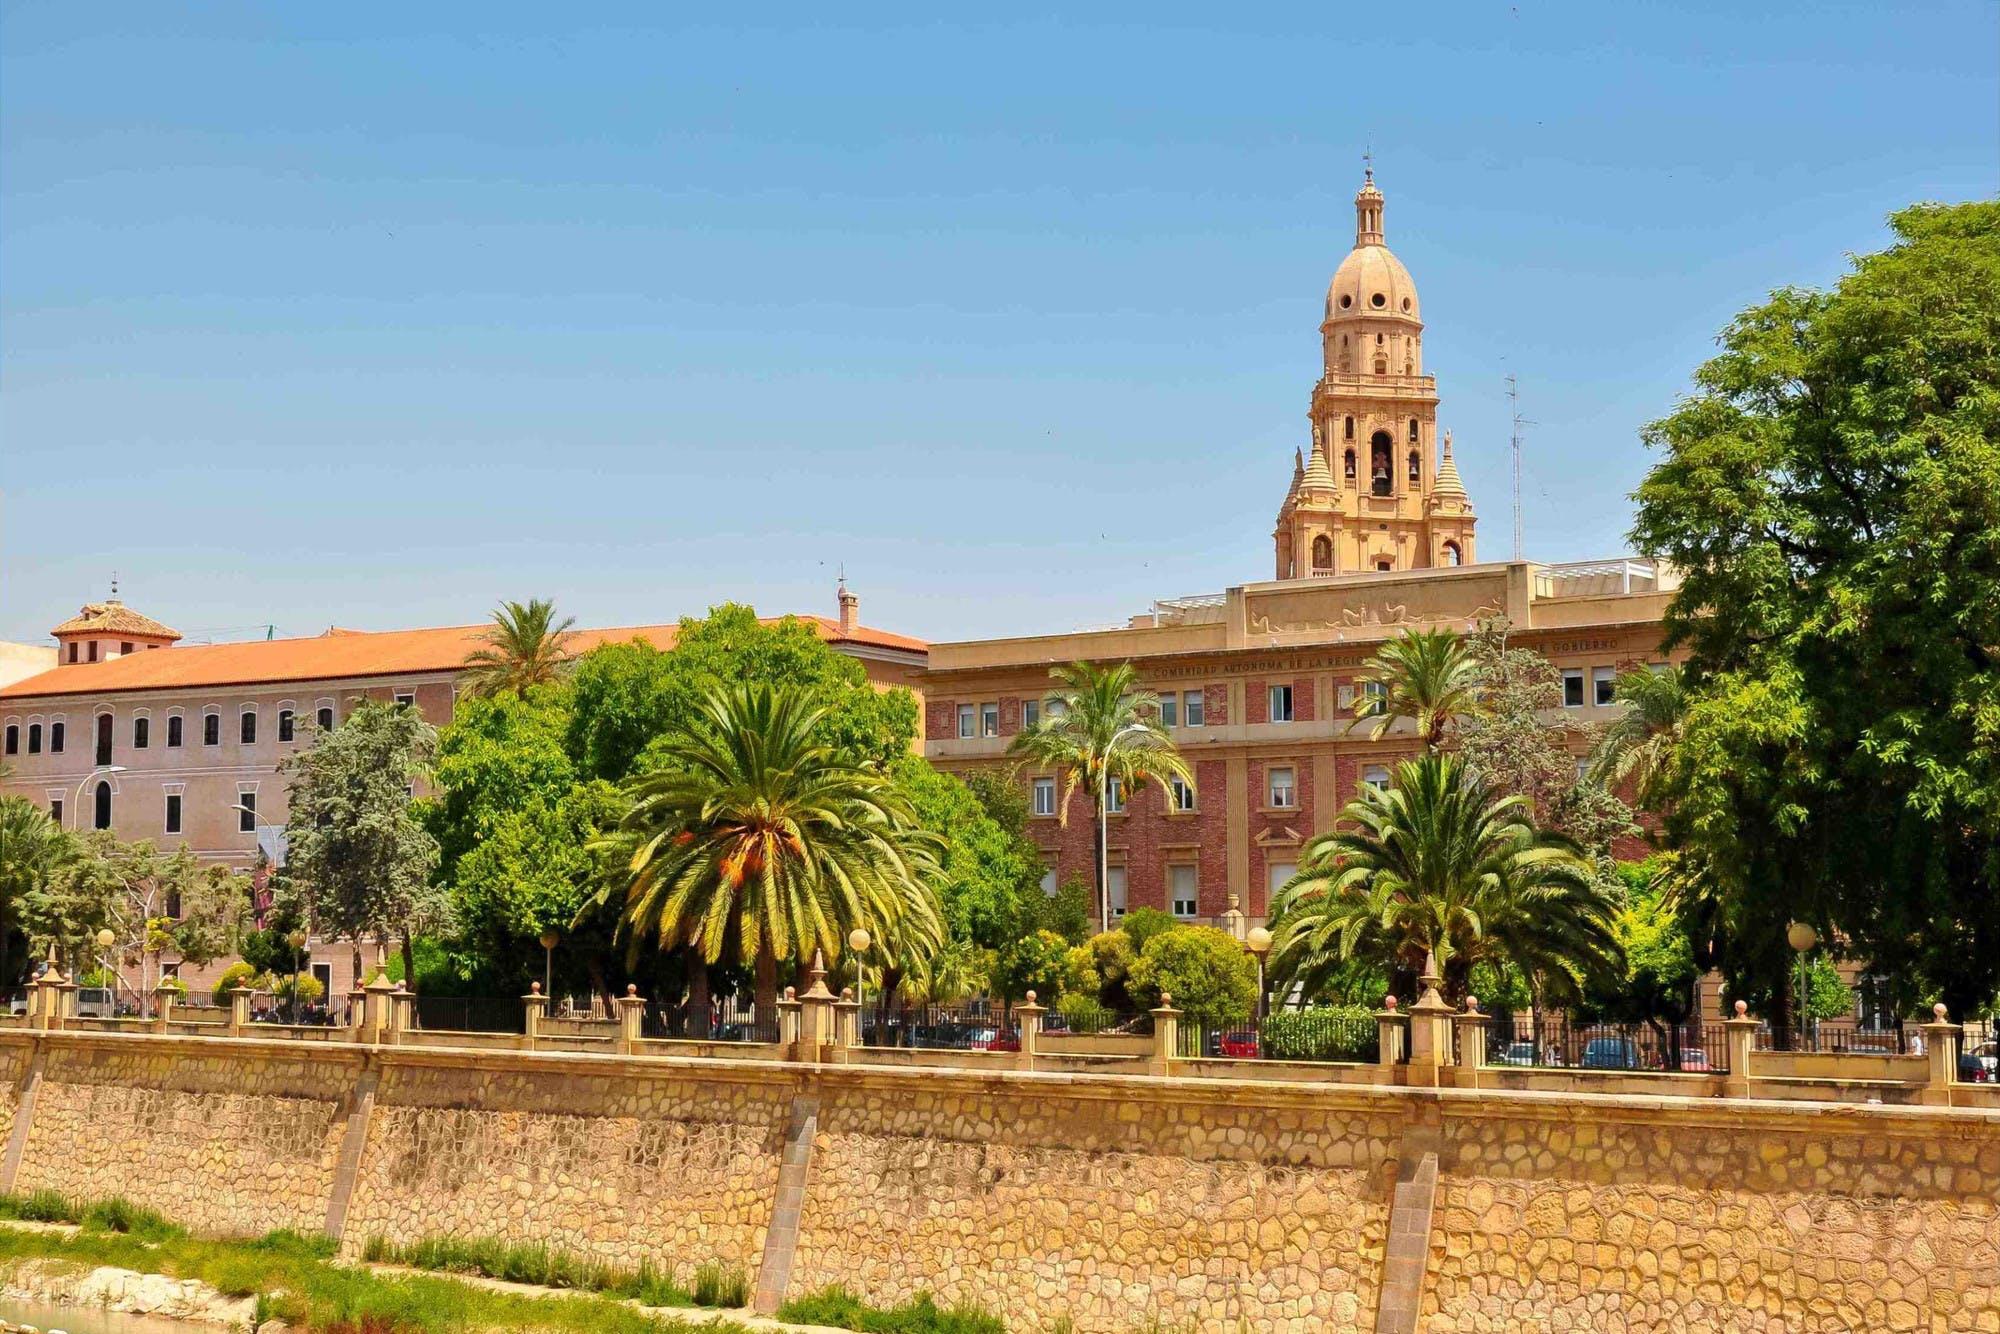 Alquiler De Autocaravanas Cerca De Murcia Indie Campers